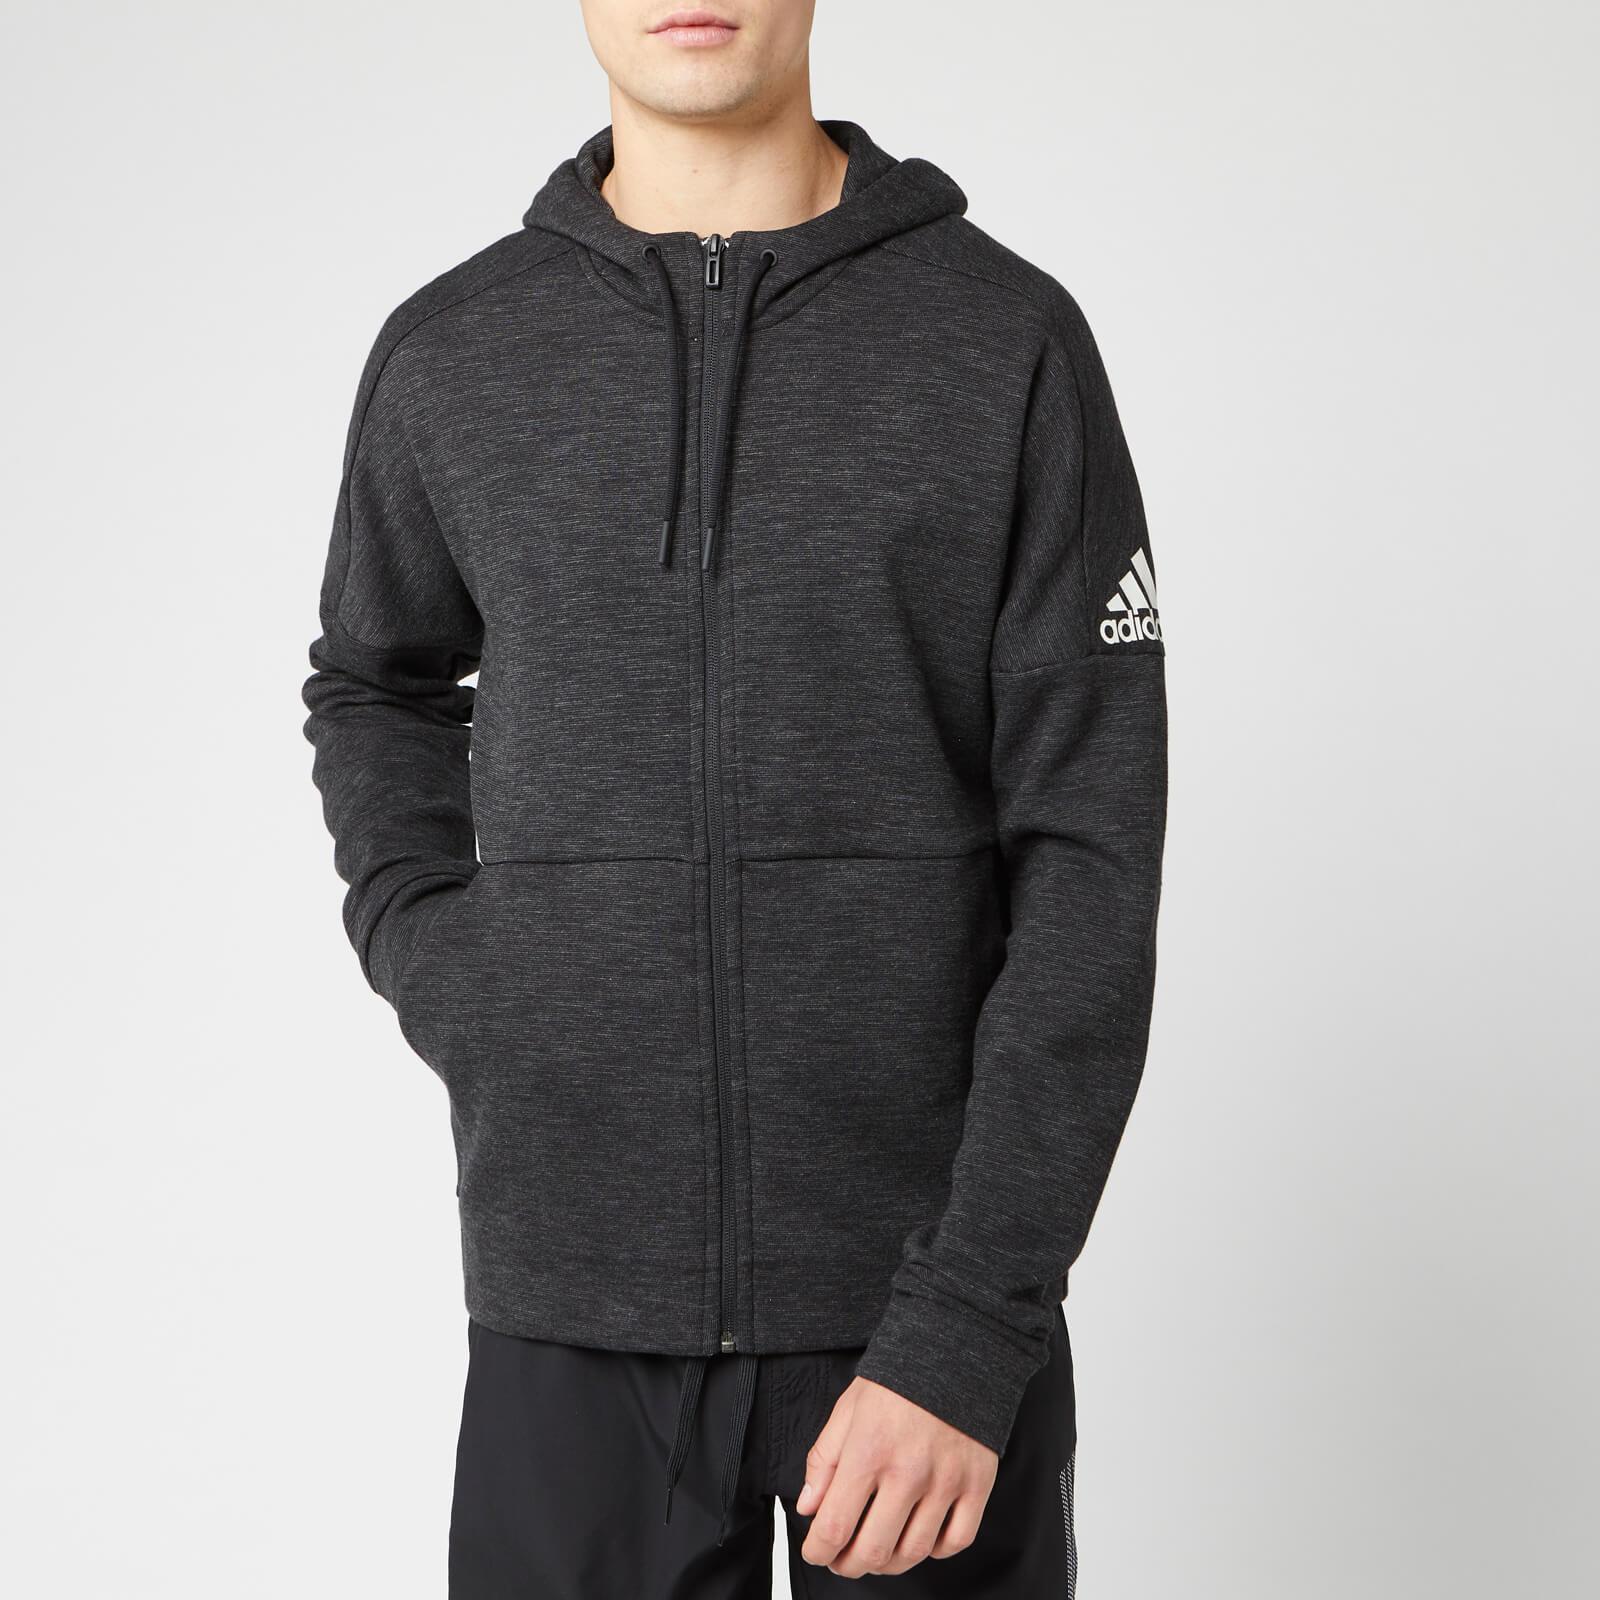 adidas Men's ID Stadium Full Zip Hoodie - Black - XL - Black